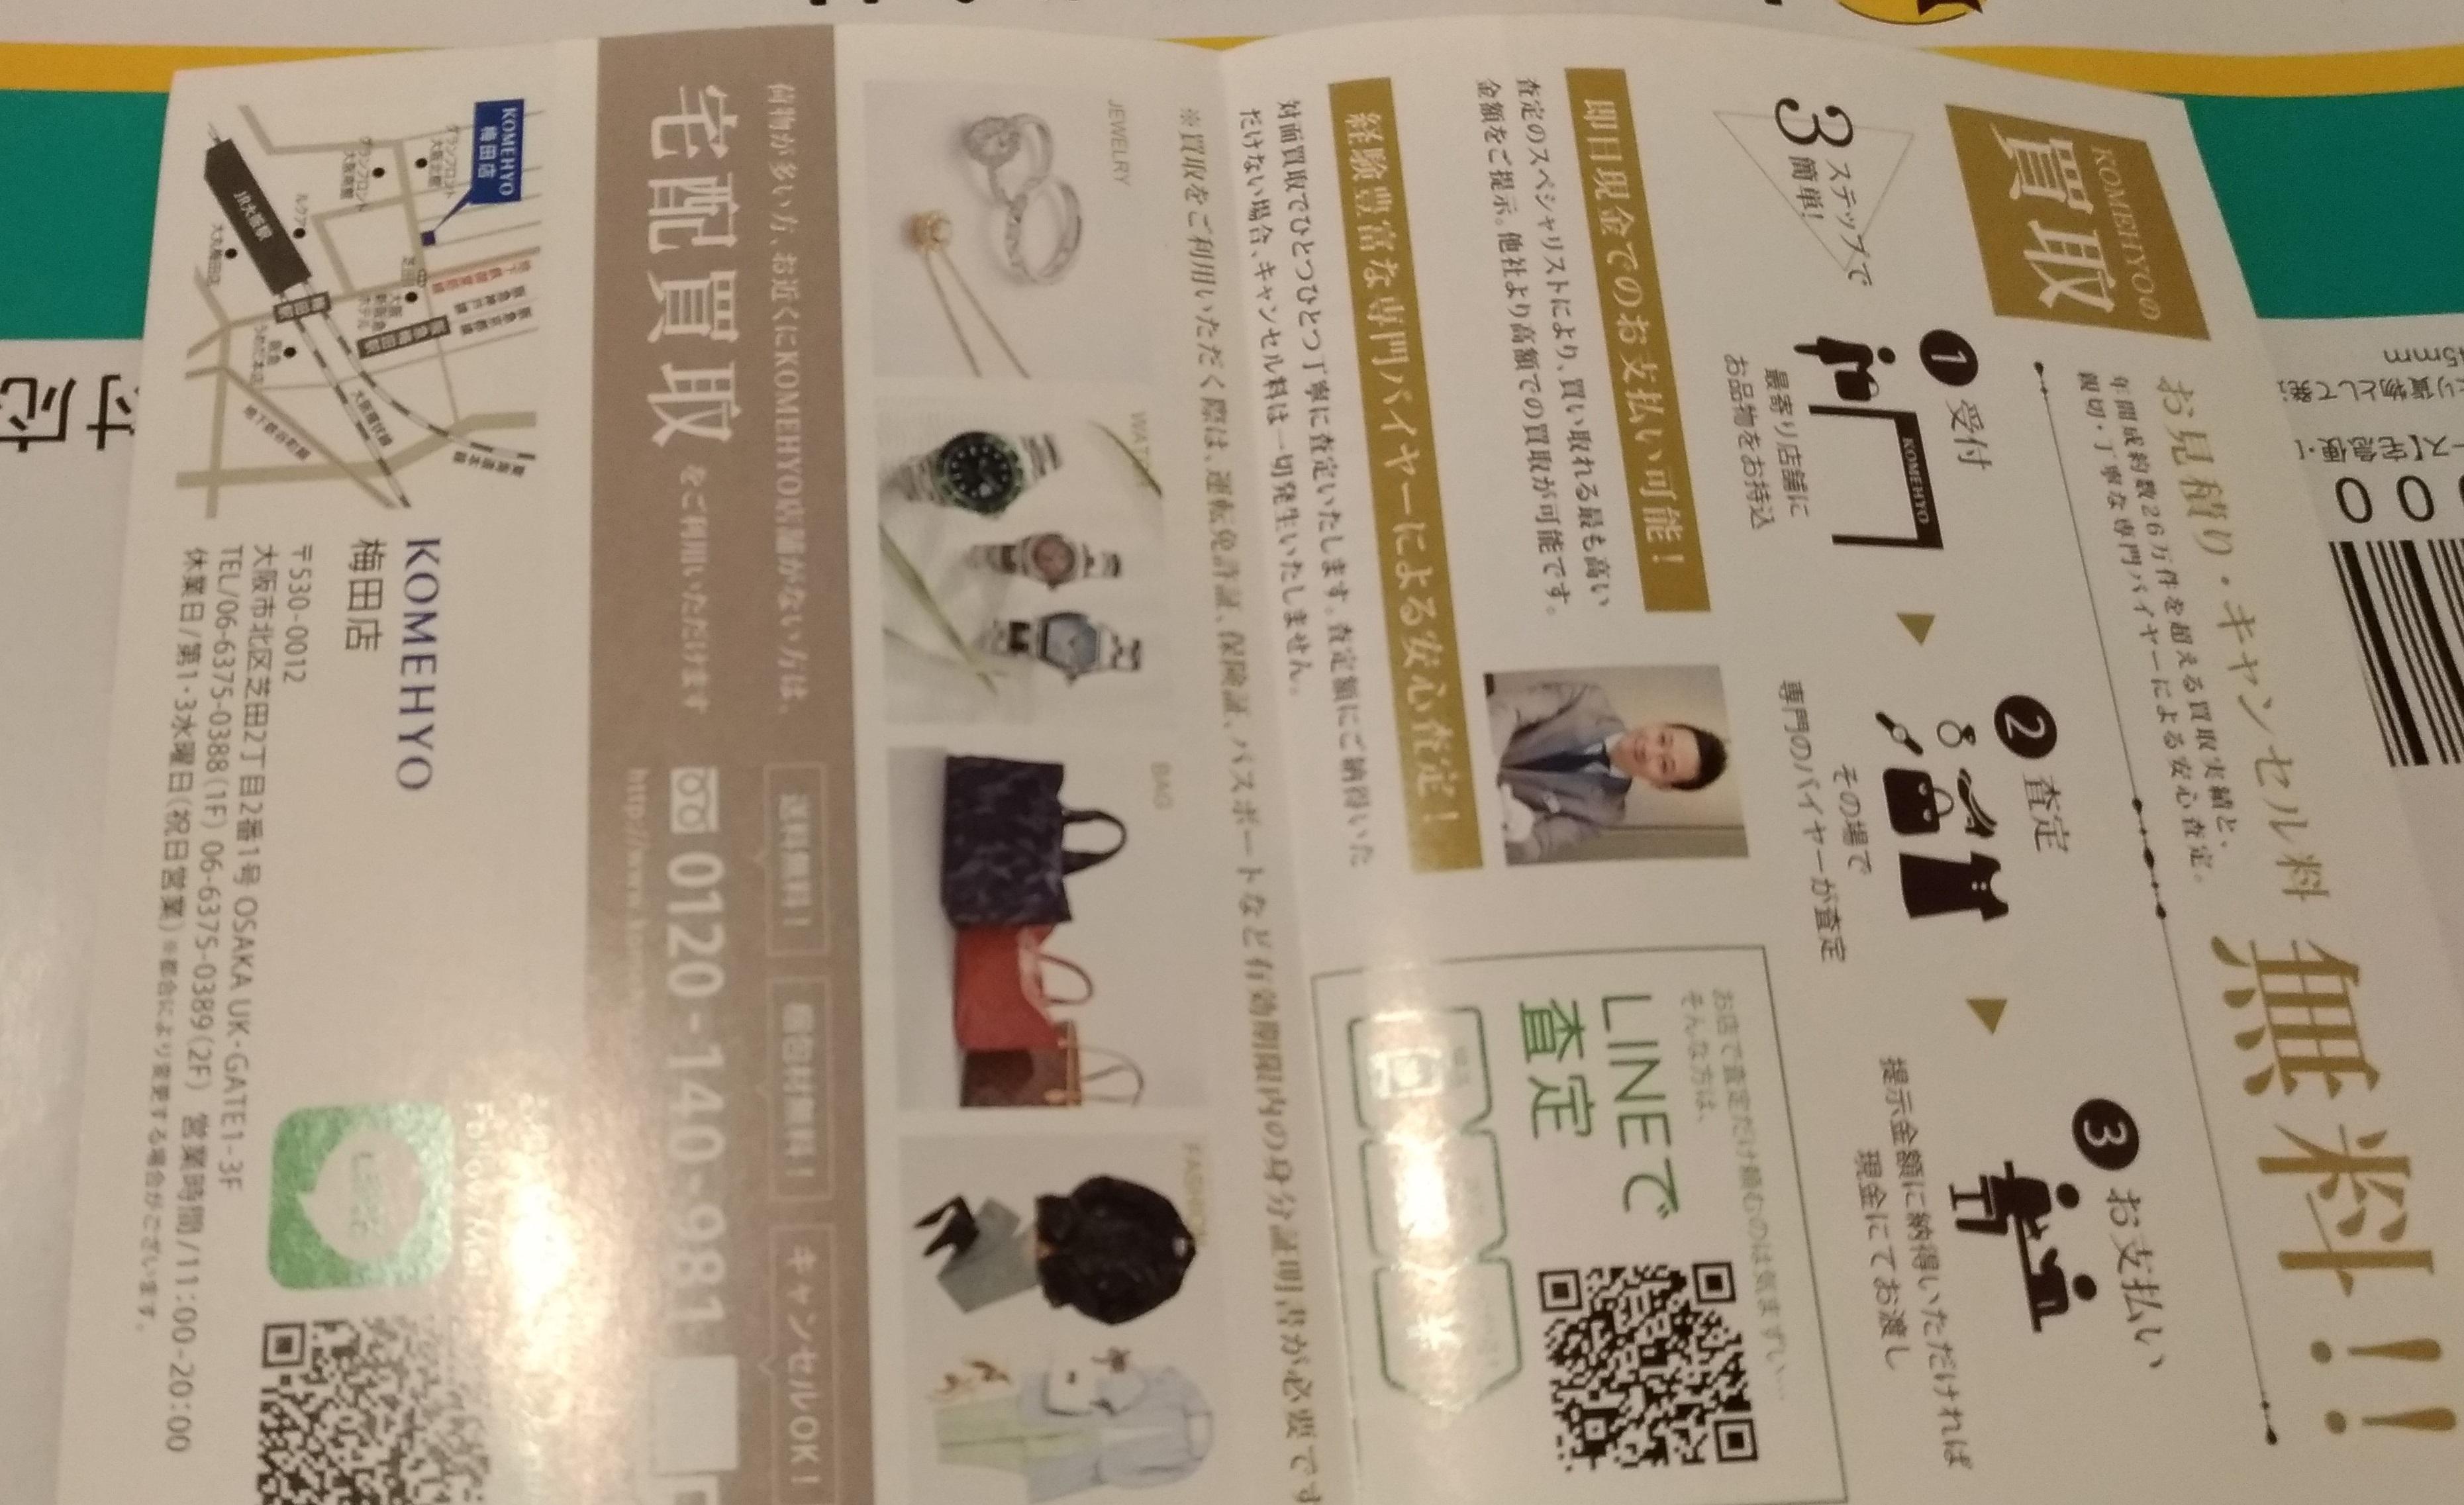 osaka_umeda_komehyo_1.jpg